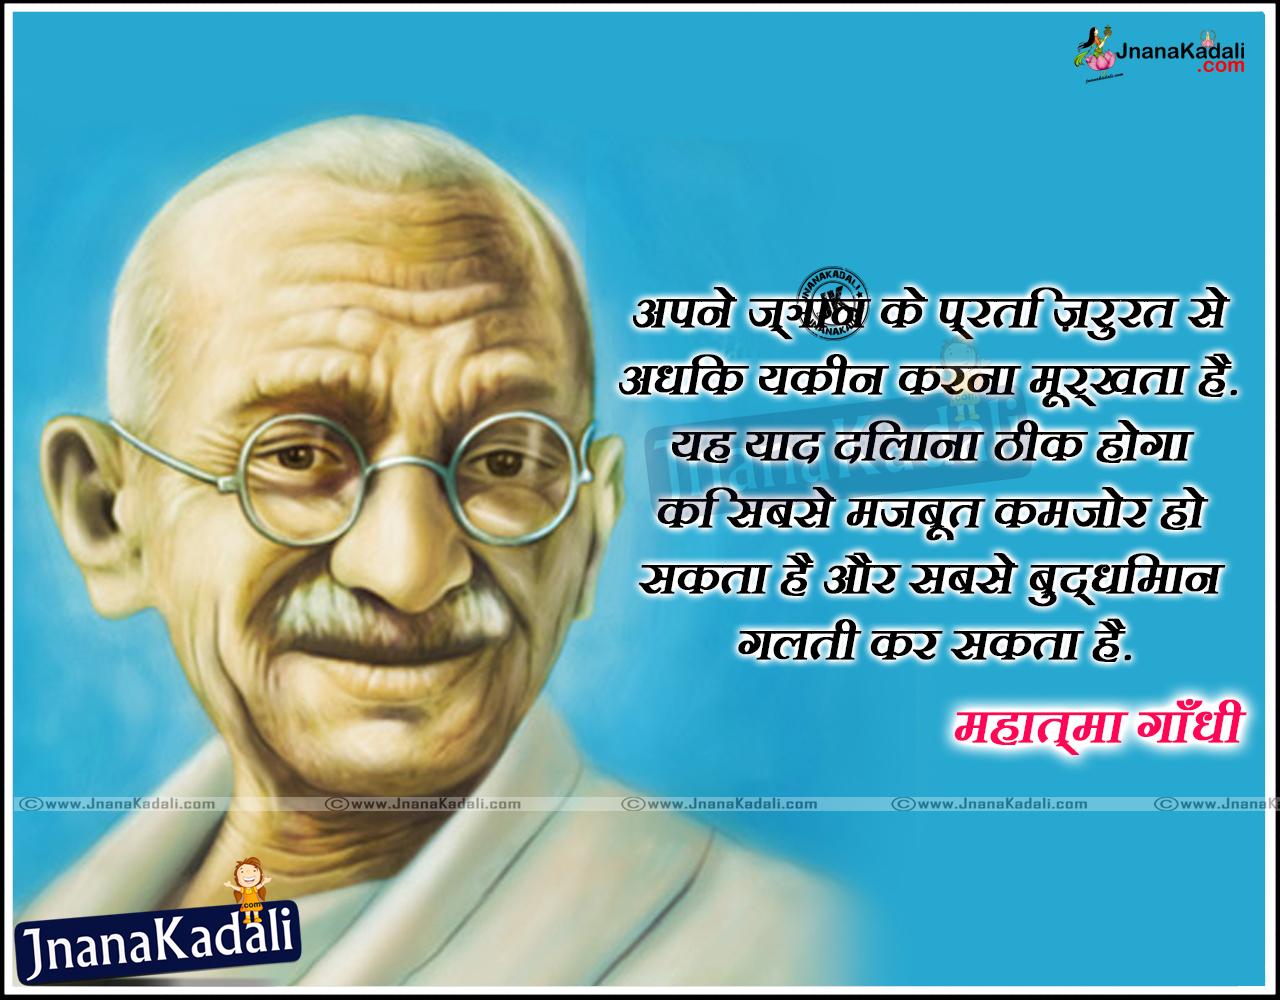 Good Morning Quotes By Mahatma Gandhi : Mahatma gandhi golden words in hindi language jnana